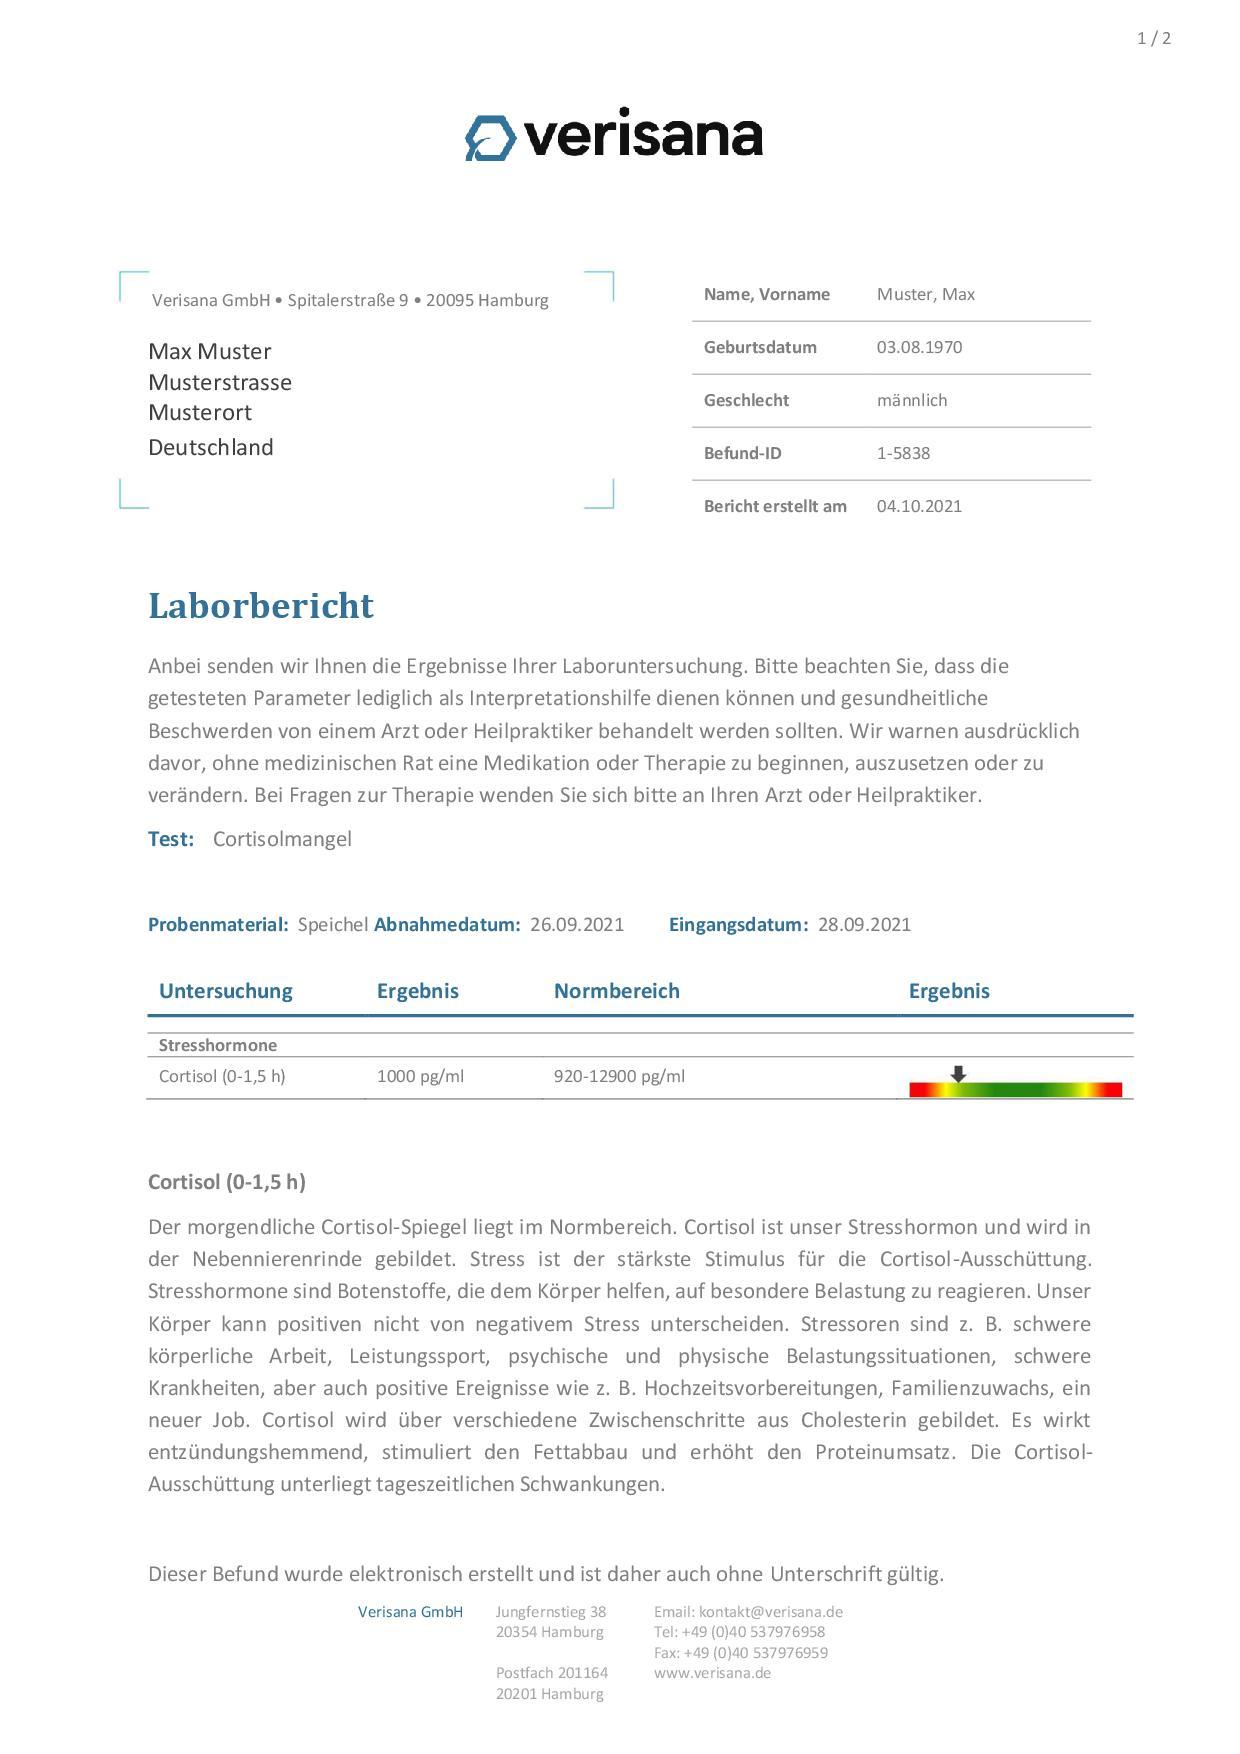 Muster Cortisolmangel